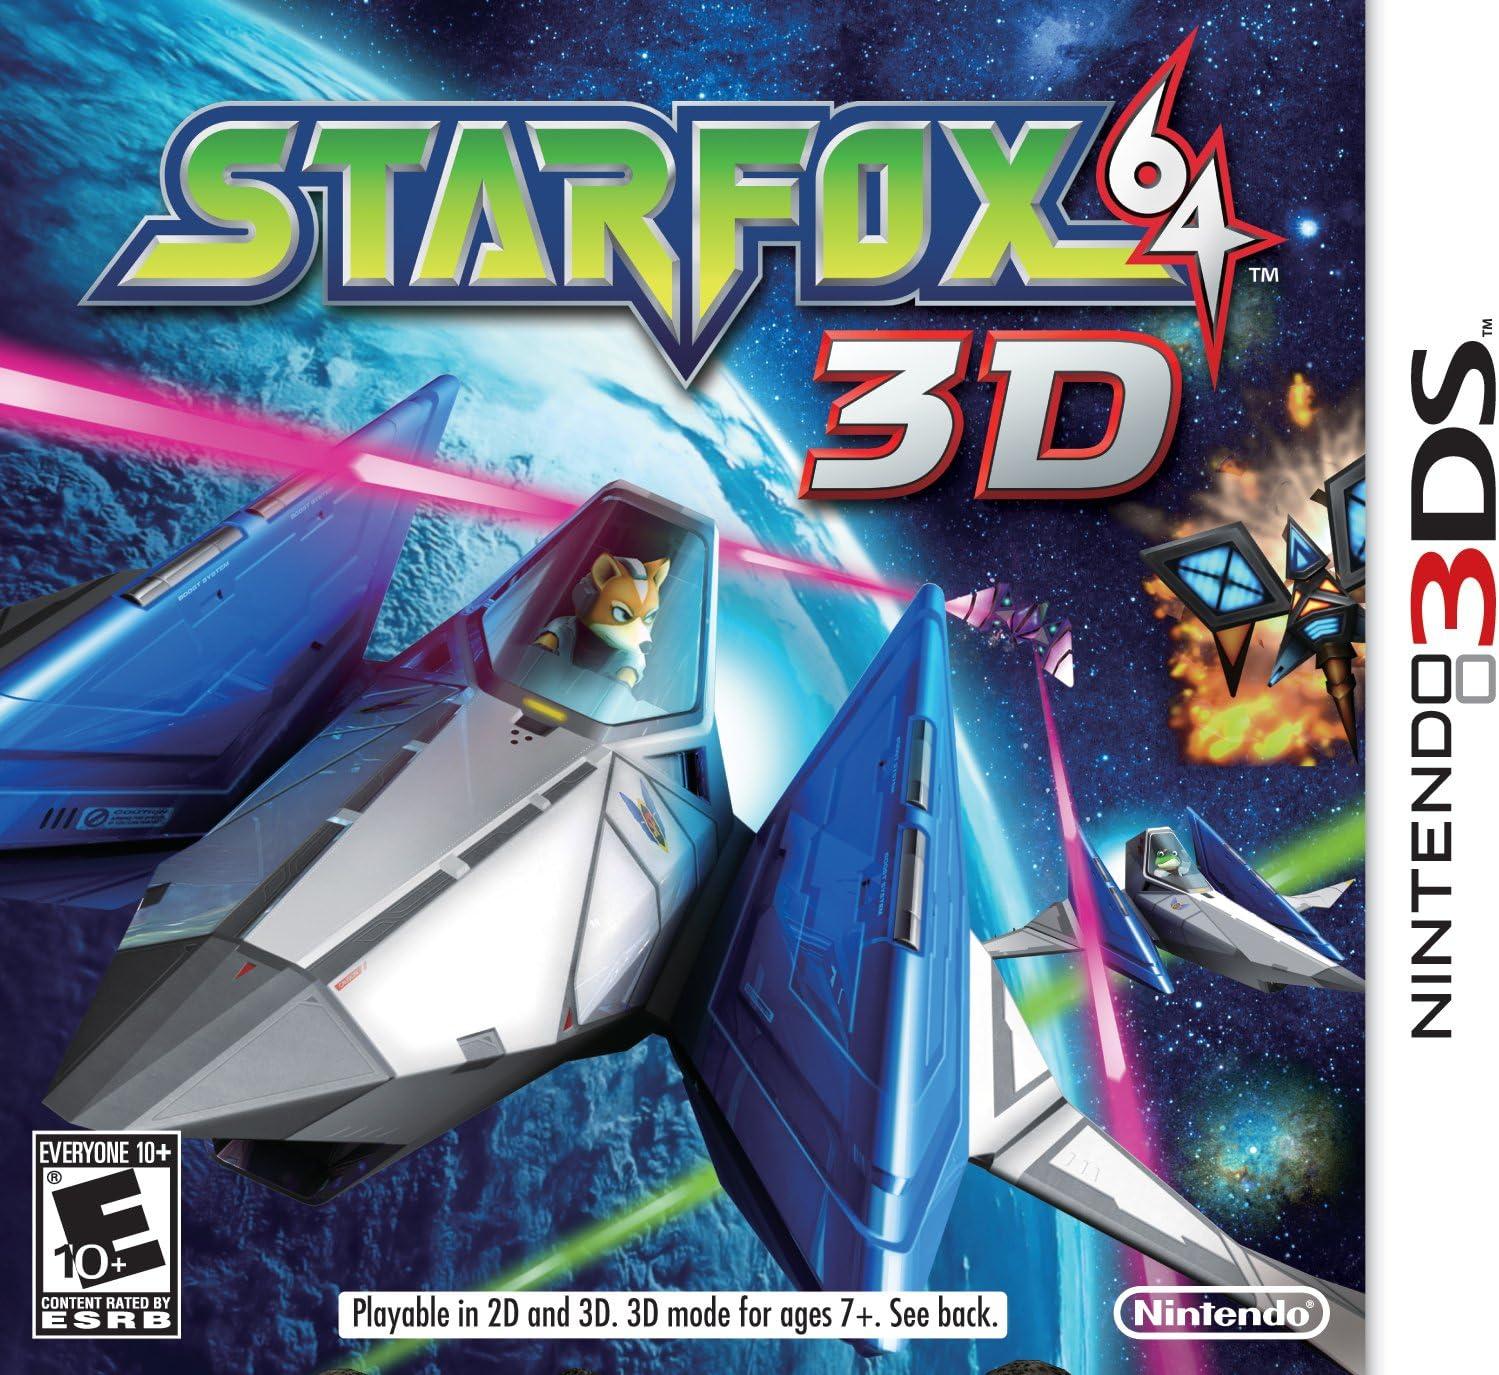 Amazon com: Star Fox 64 3D: Video Games